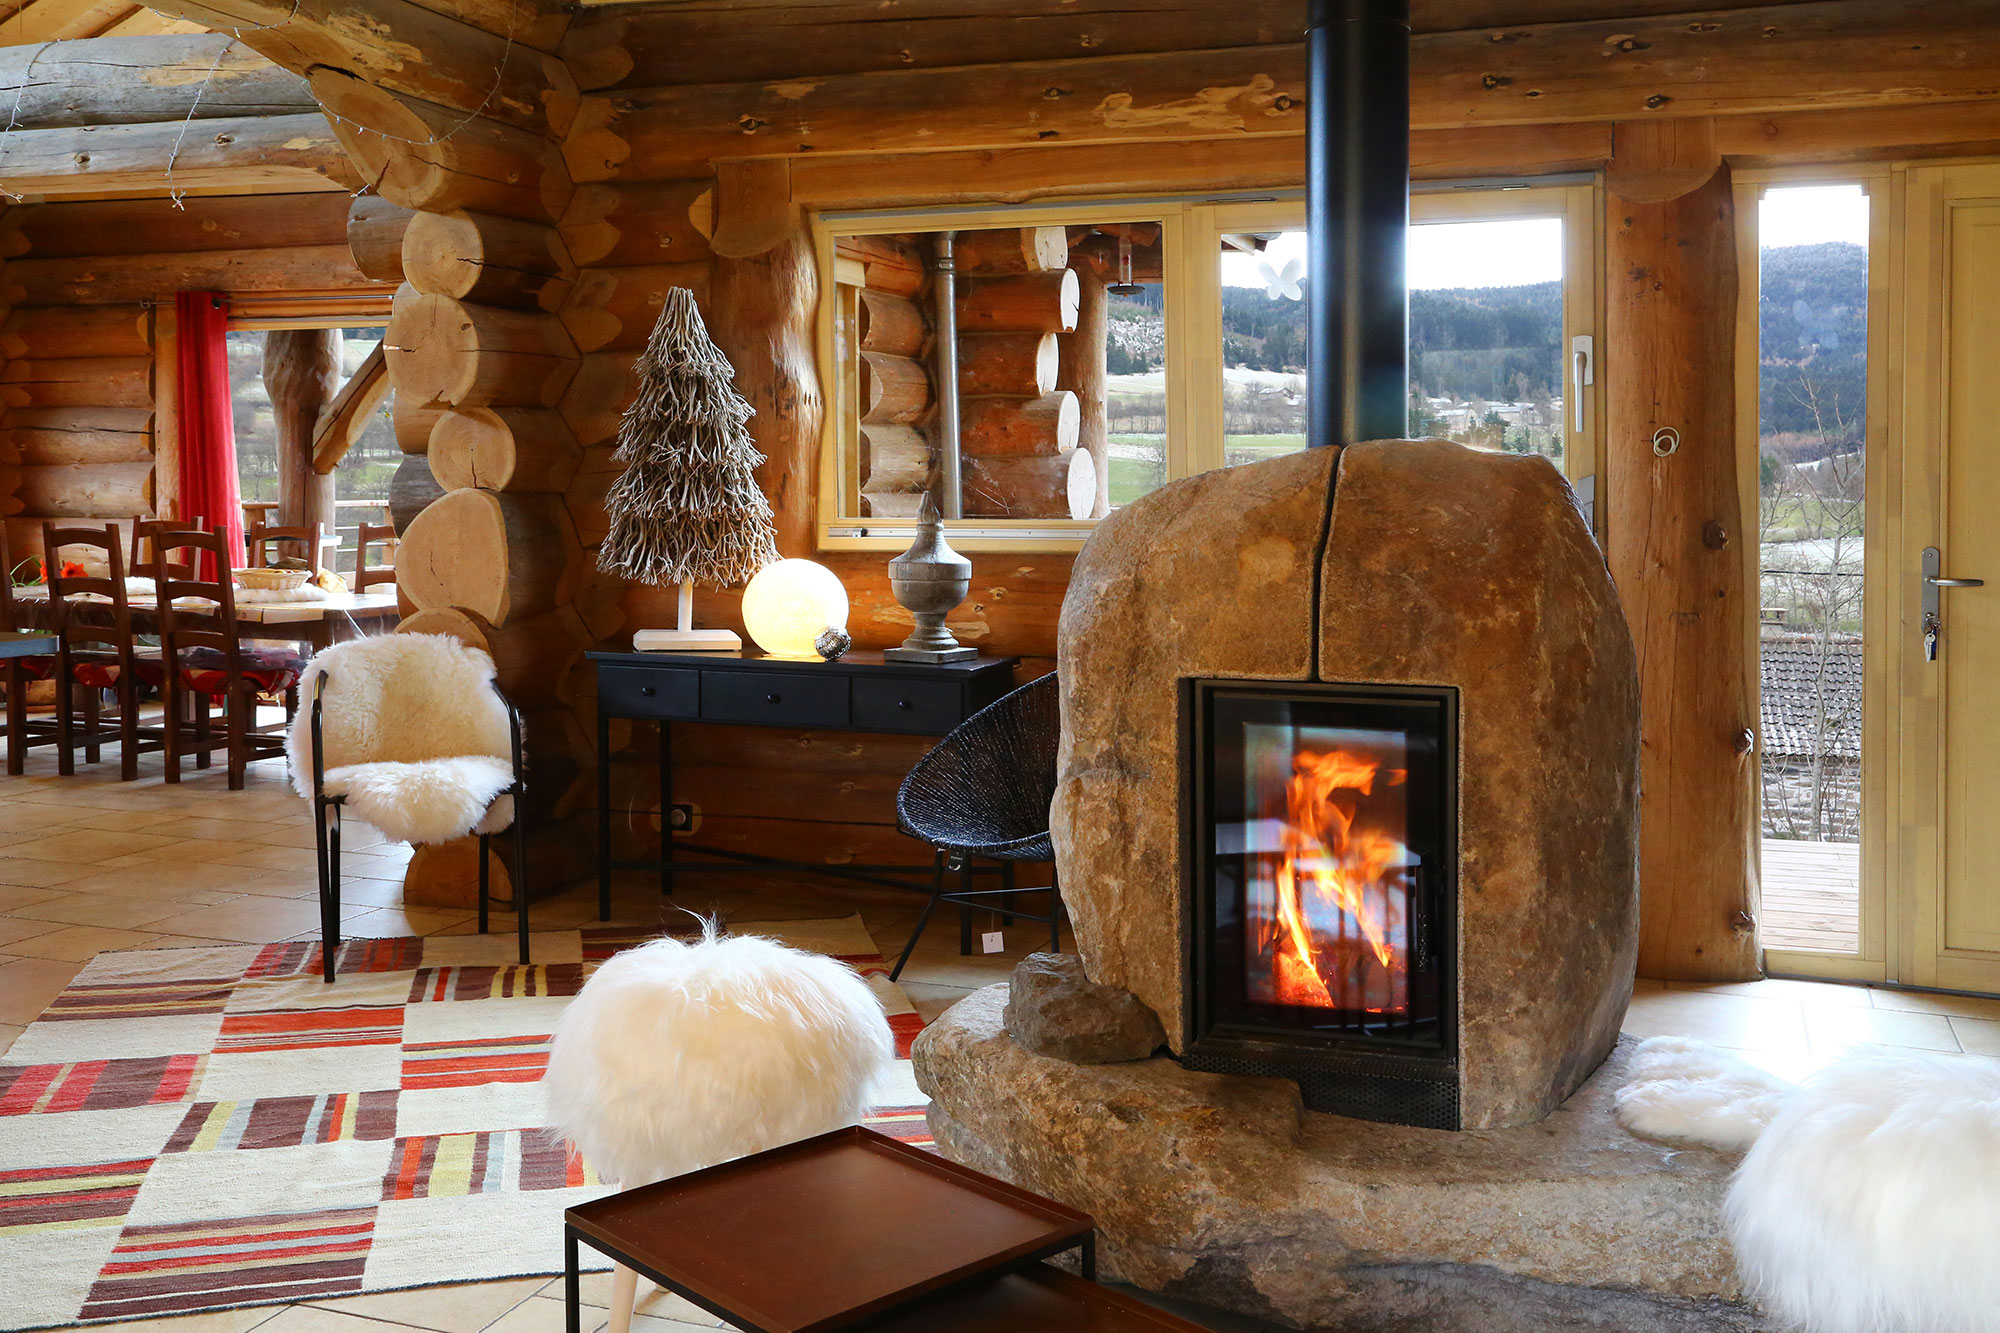 Vulcar, cheminées Royer, Auvergne Rhône-Alpes